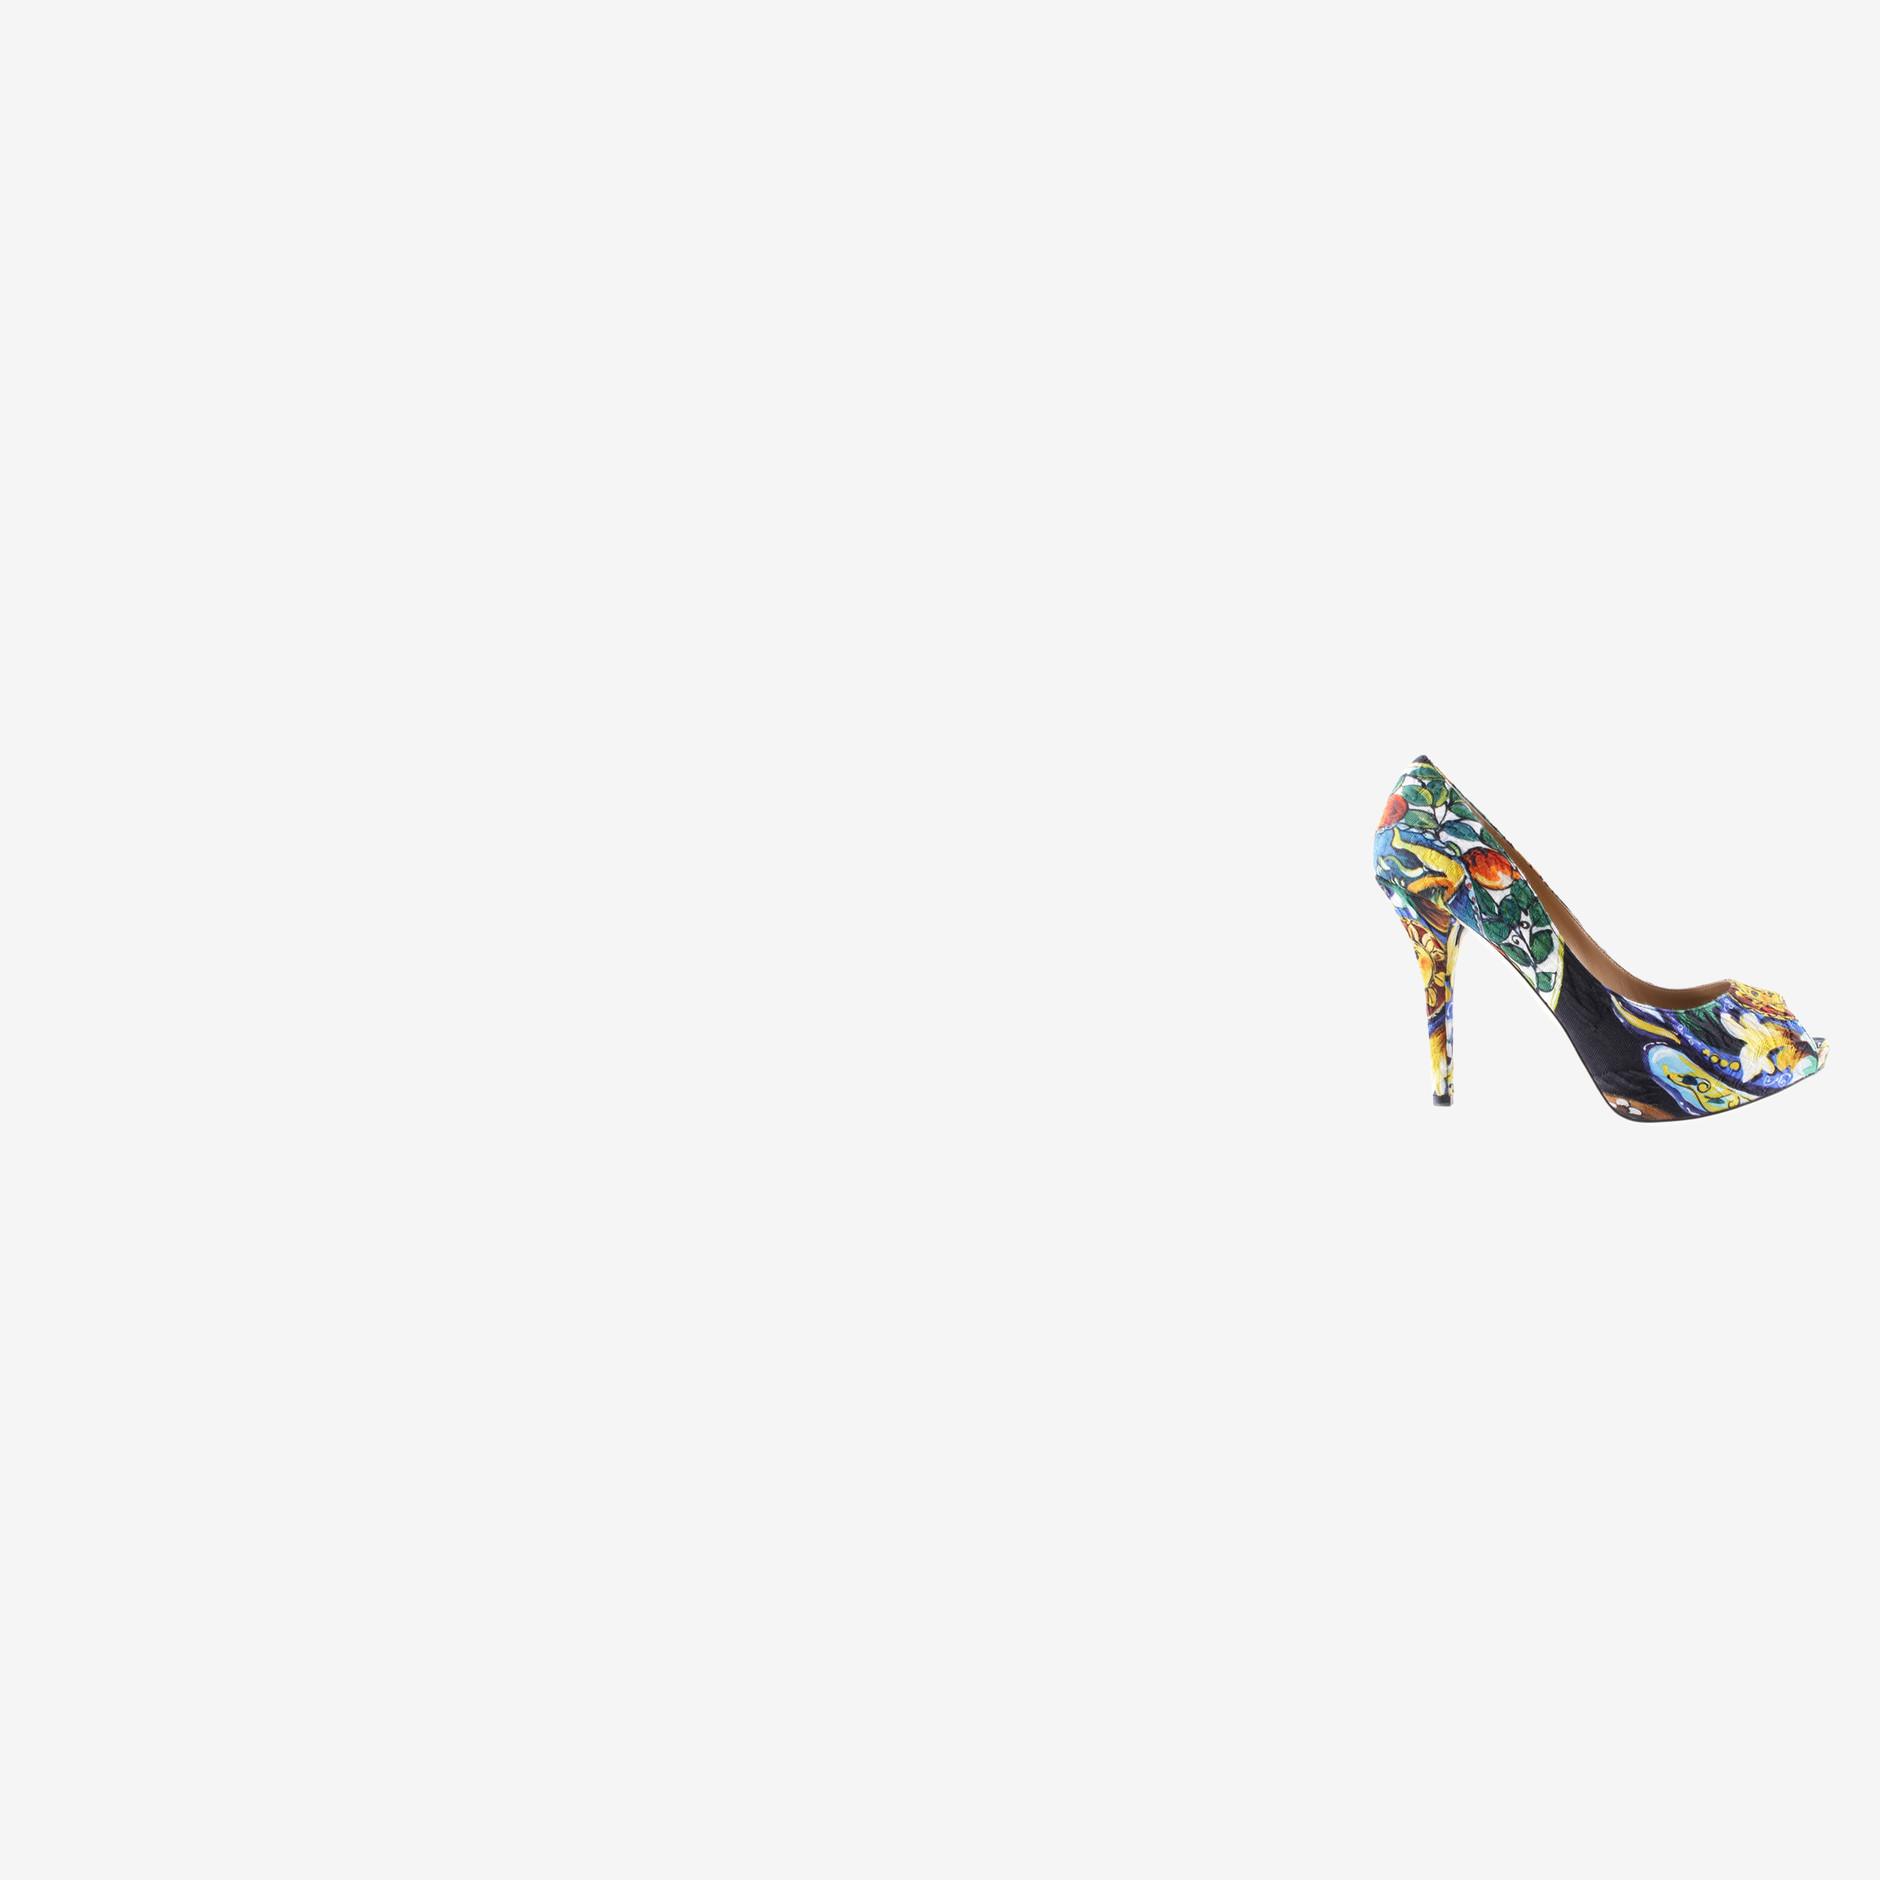 Dolce & Gabbana Second Hand